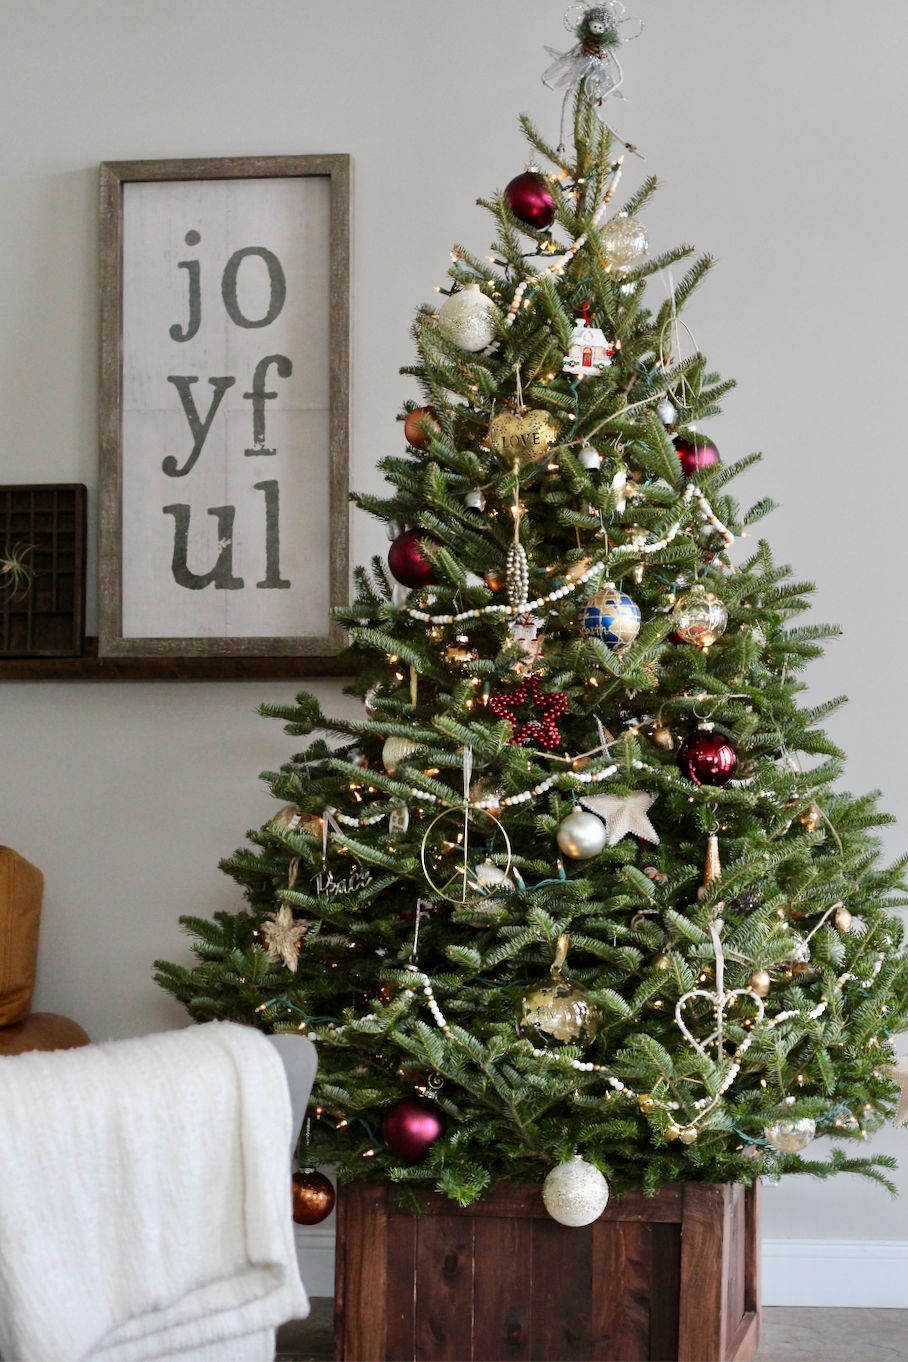 Fresh Christmas Tree in wood box.